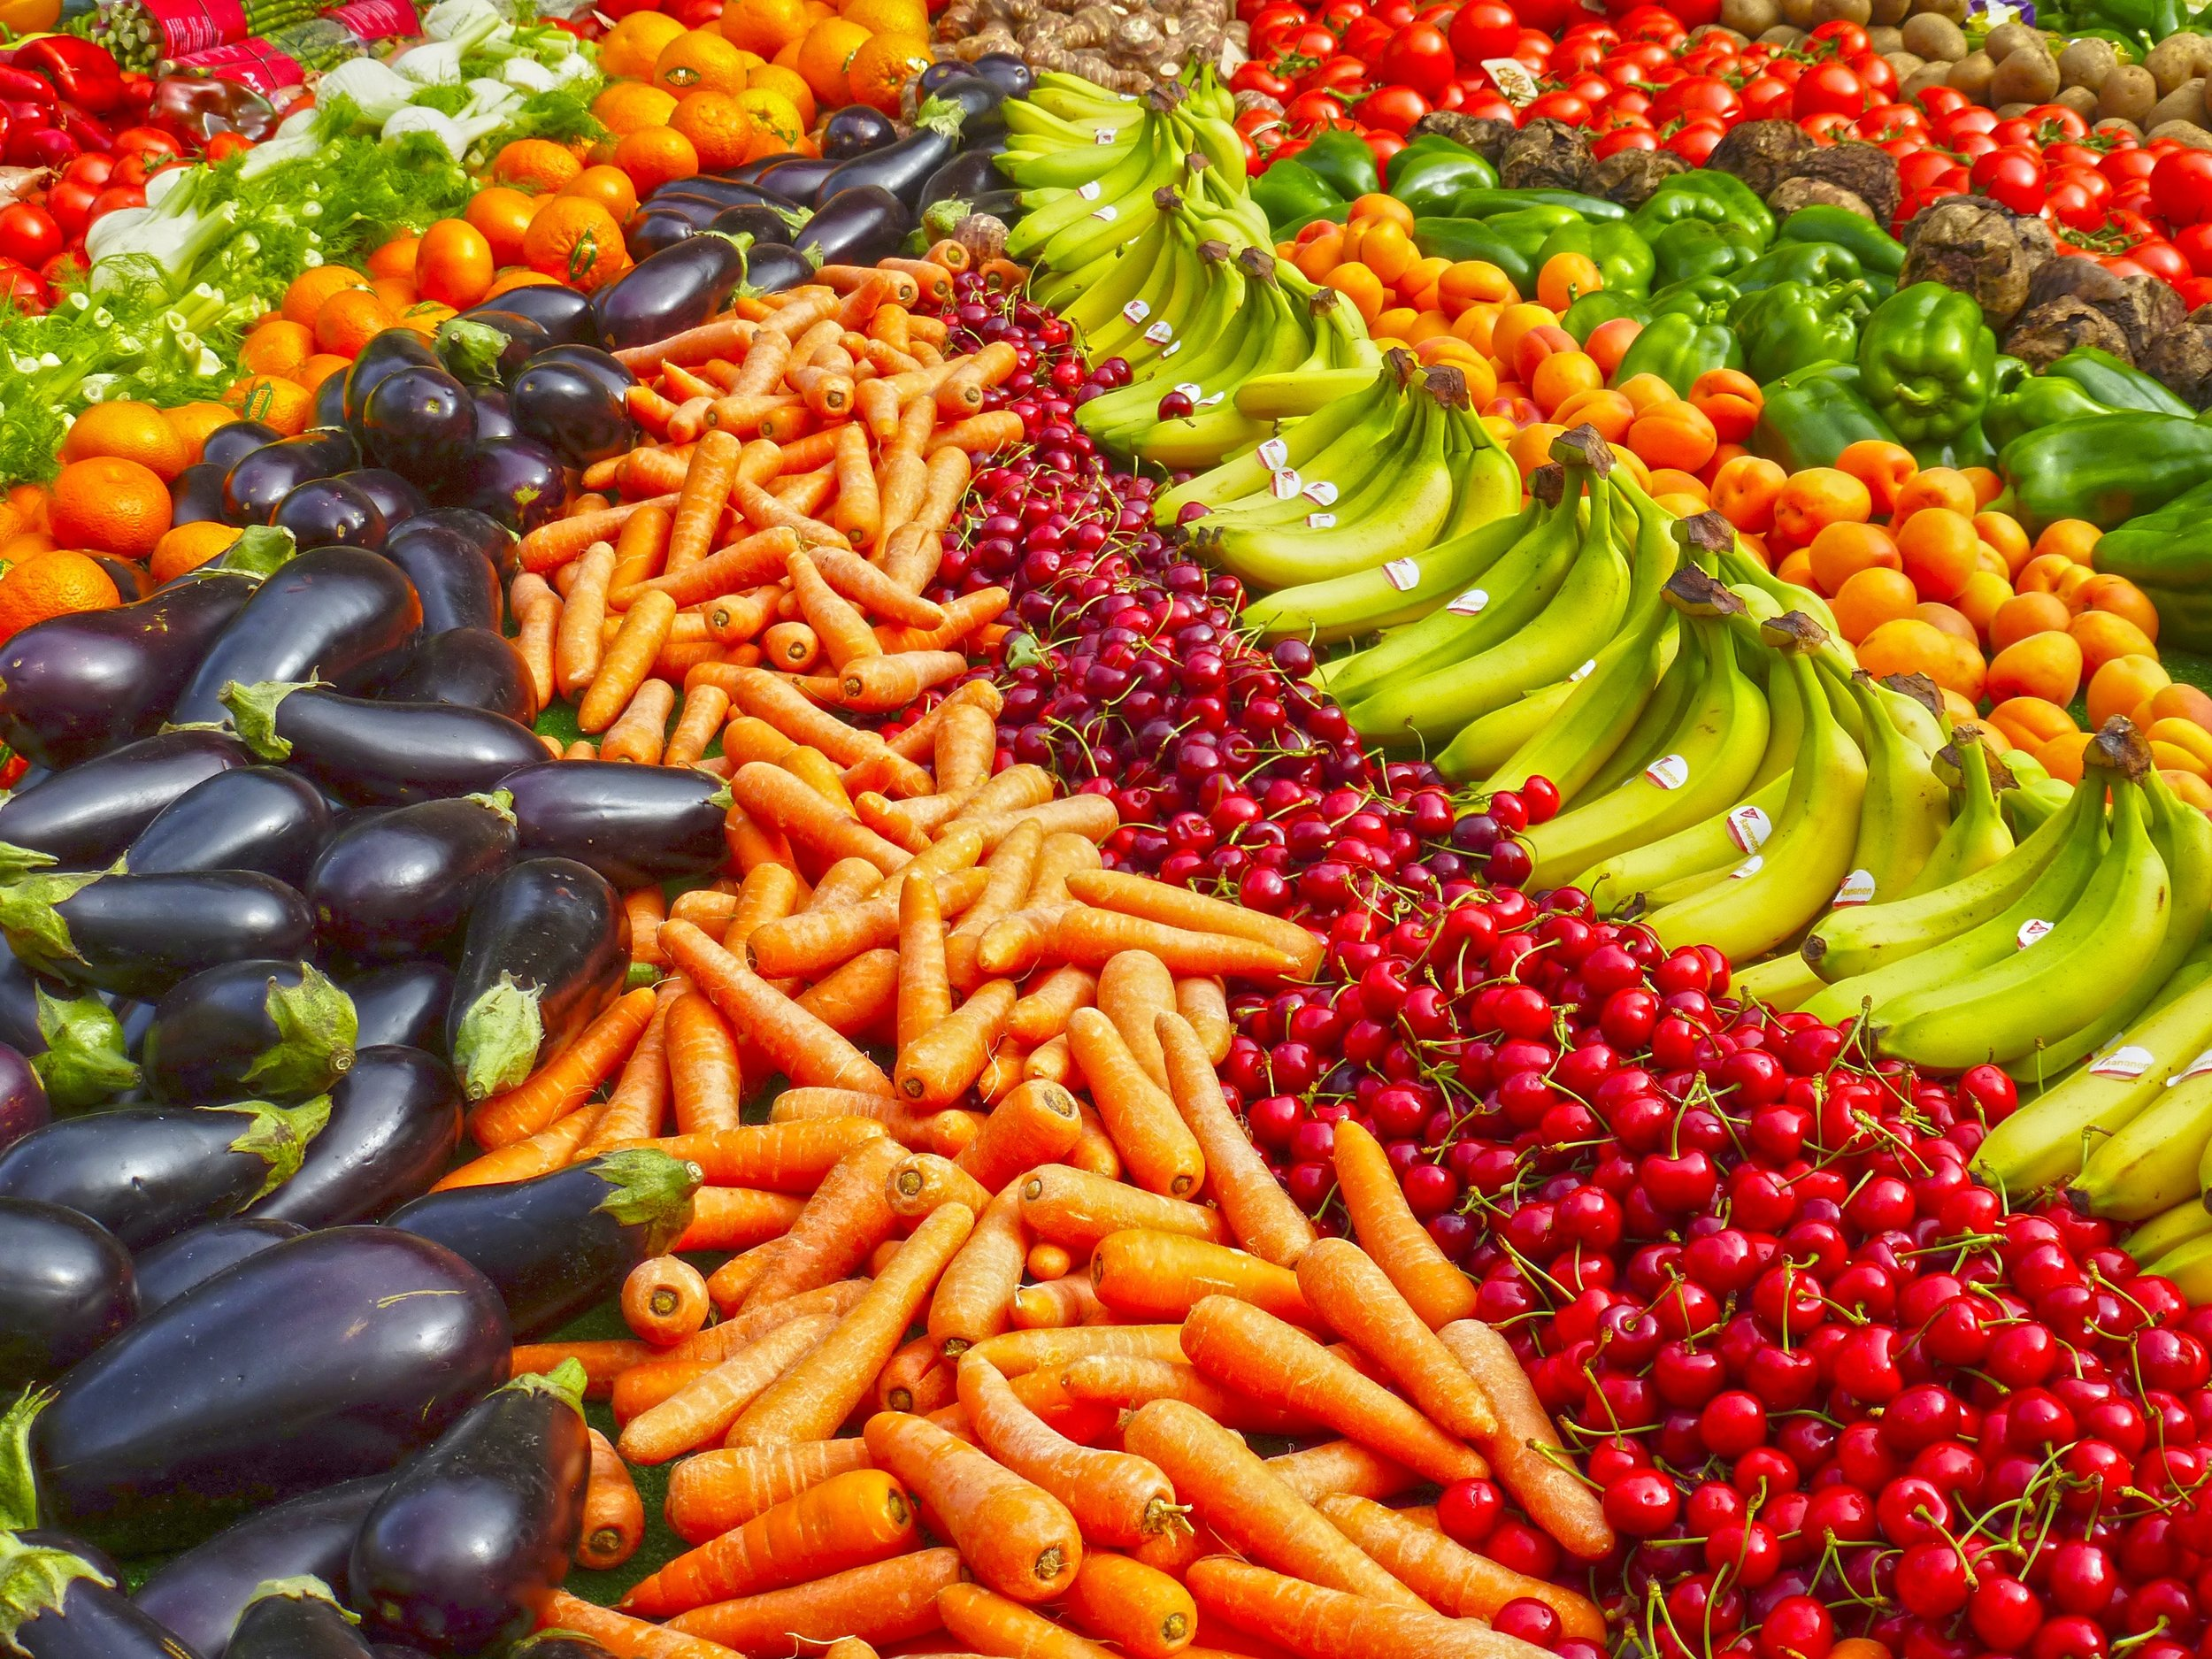 abundance-agriculture-bananas-264537.jpg